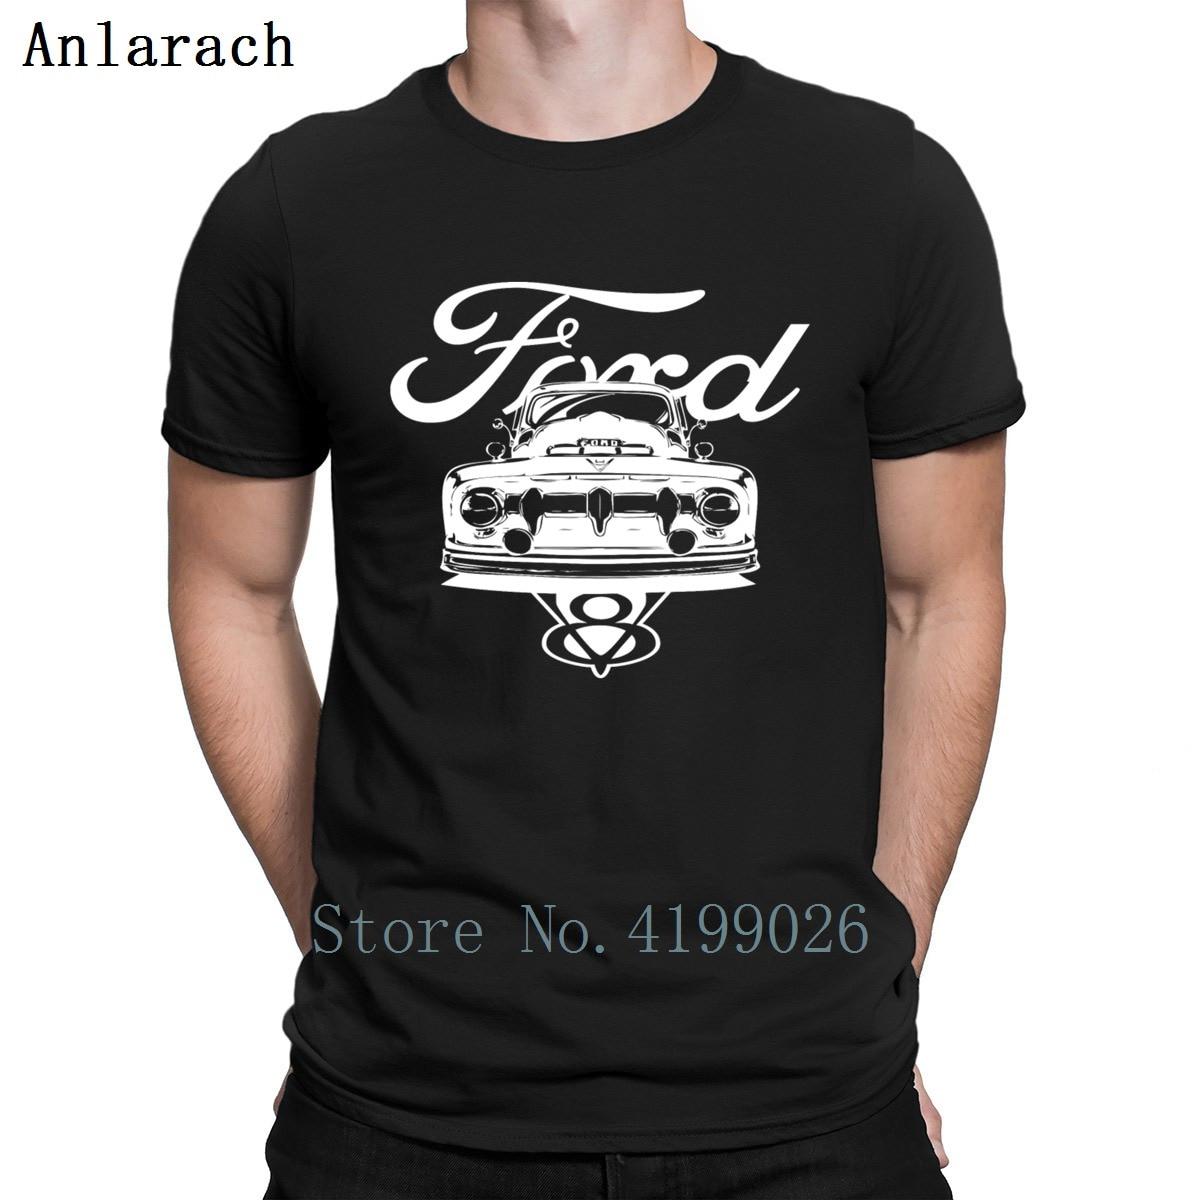 Nuevo 1952 Forde Pickup Shirt camiseta Super Hiphop marca Original algodón camiseta para hombres impresión masculina 2018 camisetas gráficas hombres